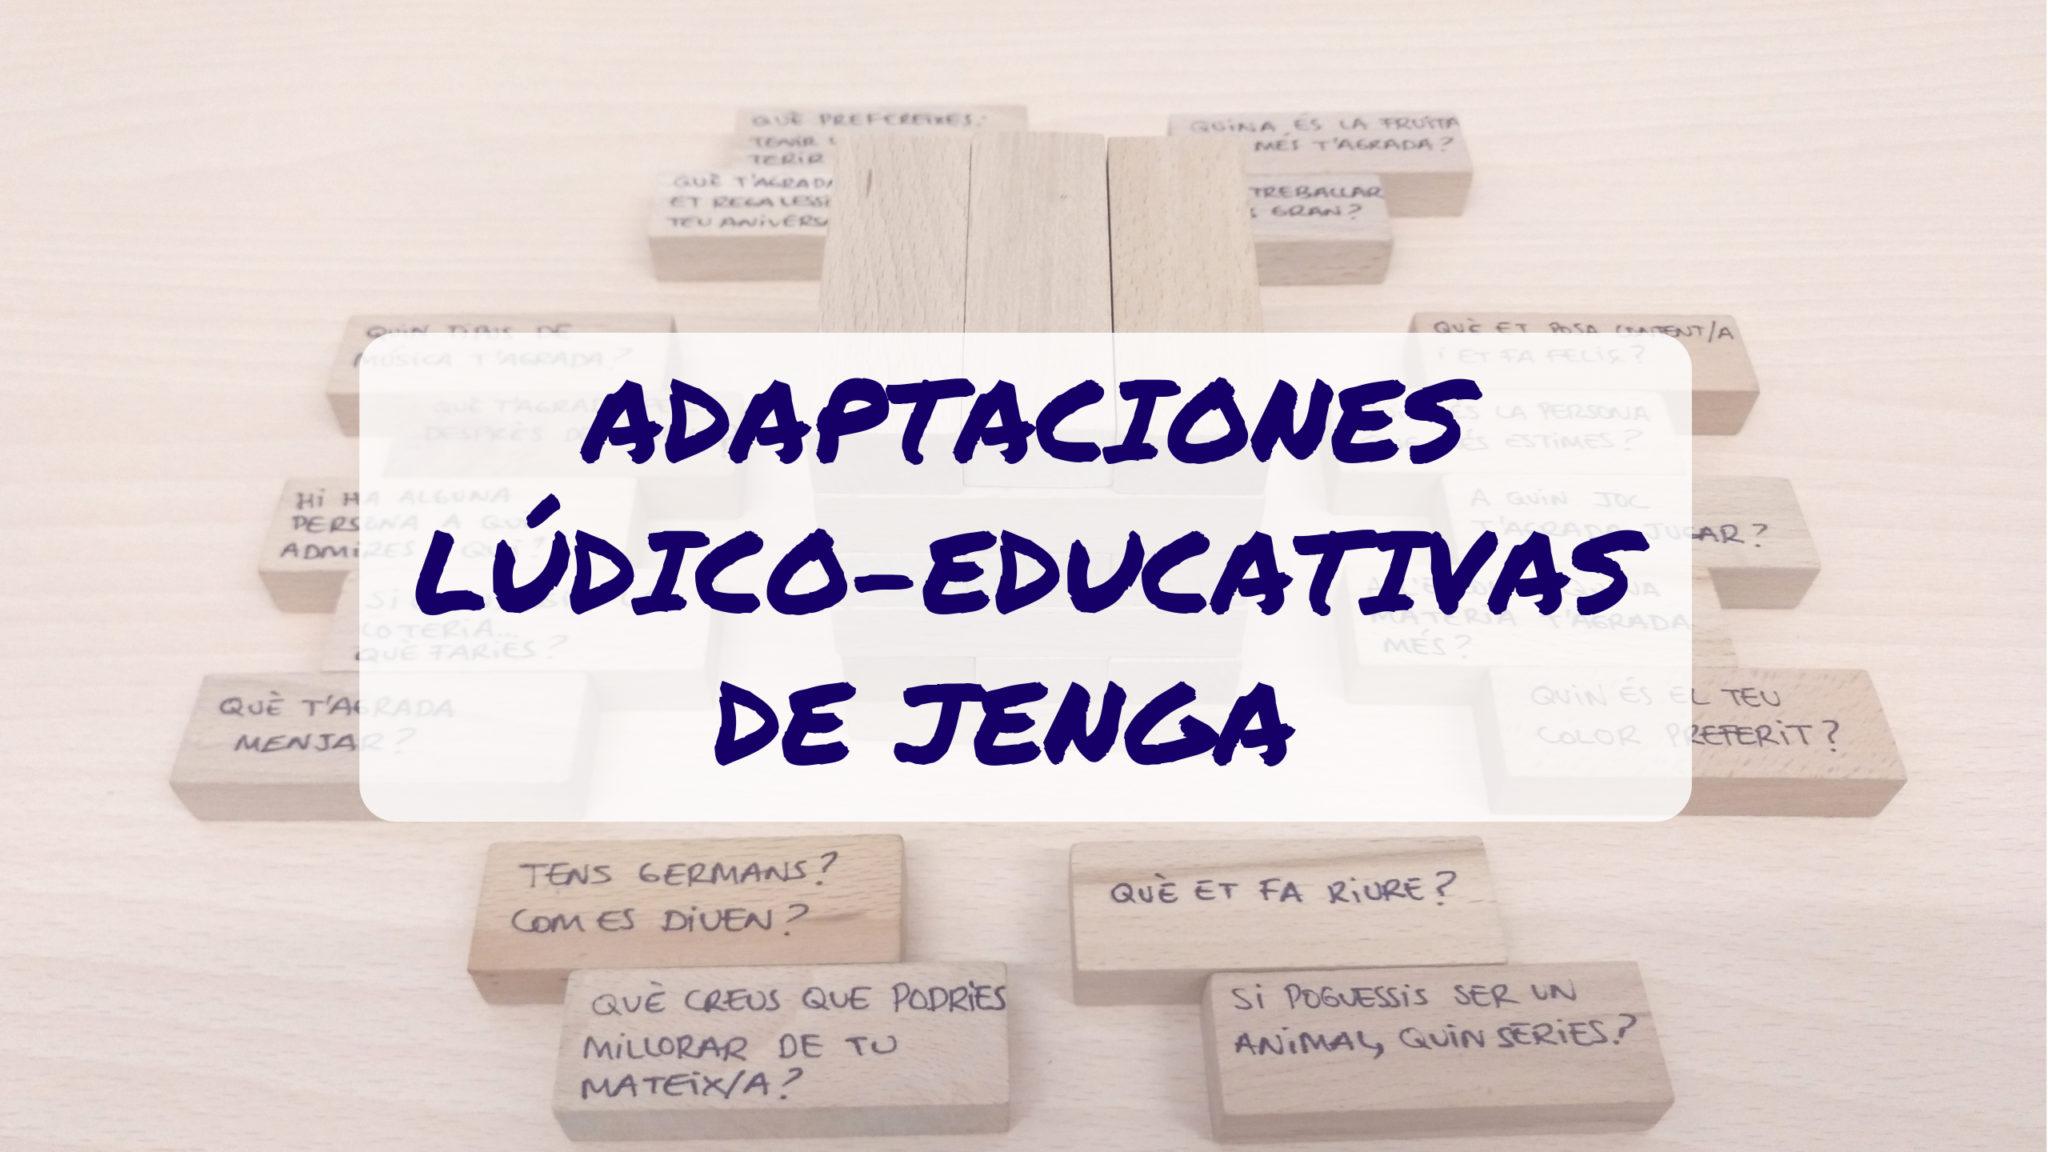 Efecto Ludico Juegos Adaptados Jenga Questions Y Story Jenga